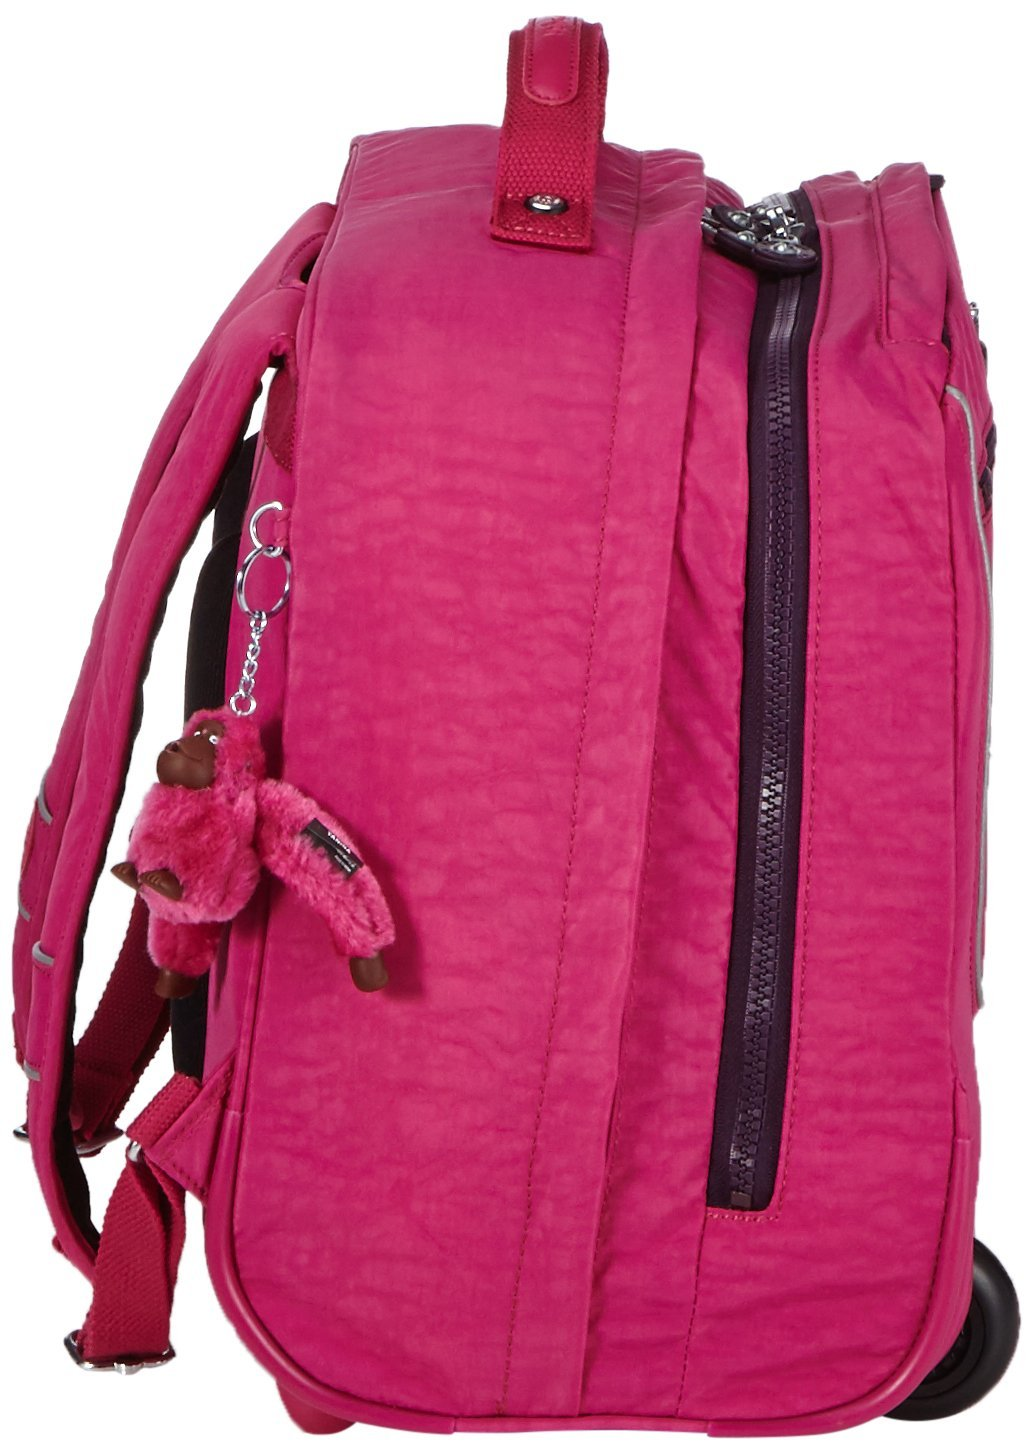 Рюкзак на колесах Kipling CLAS DALLIN цвет малиновый, - фото 3